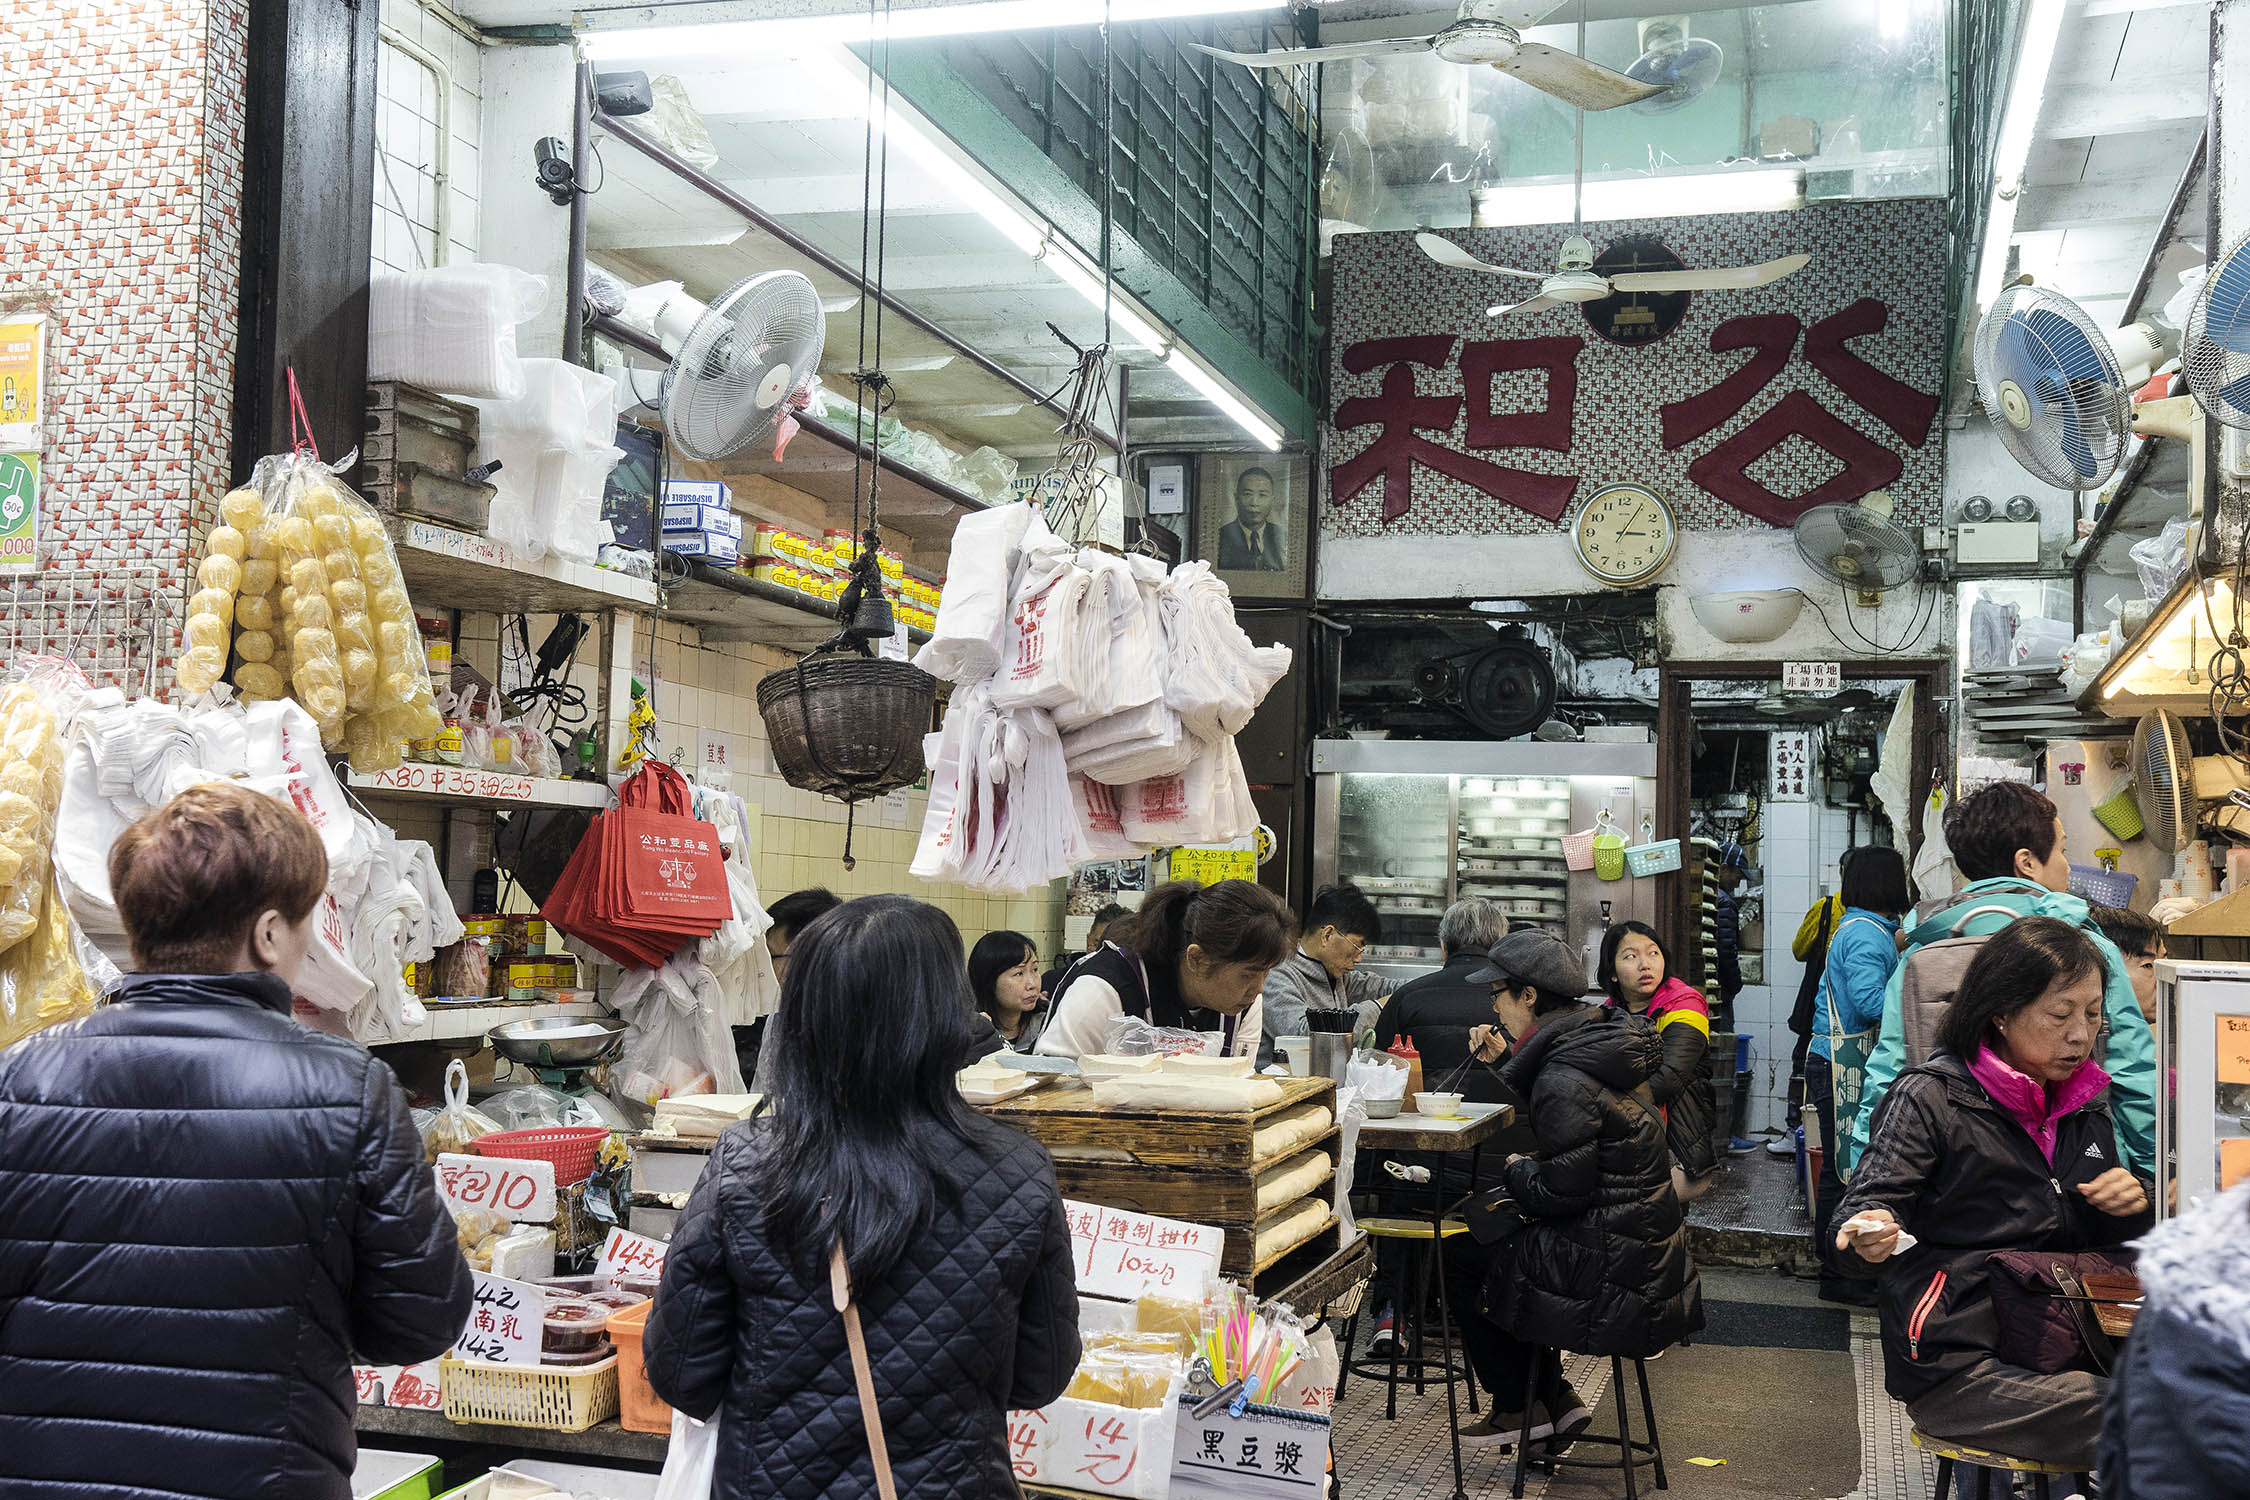 Kung Wo Beancurd Factory